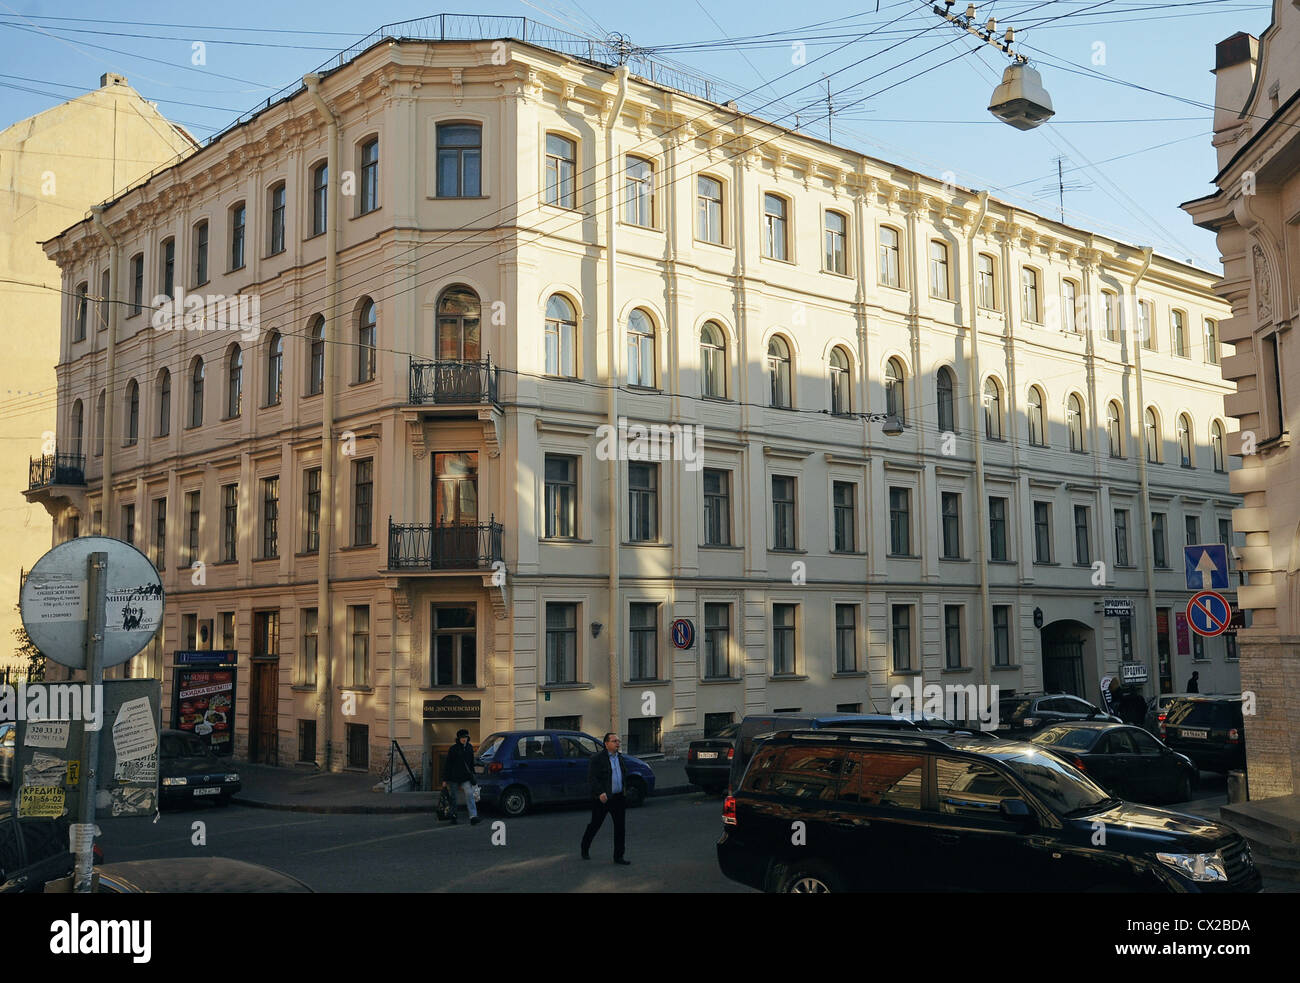 ITAR-TASS: ST PETERSBURG, RUSSIA. OCTOBER 7, 2010. Memorial plque outside the Fyodor Dostoyevsky Literary Memorial - Stock Image